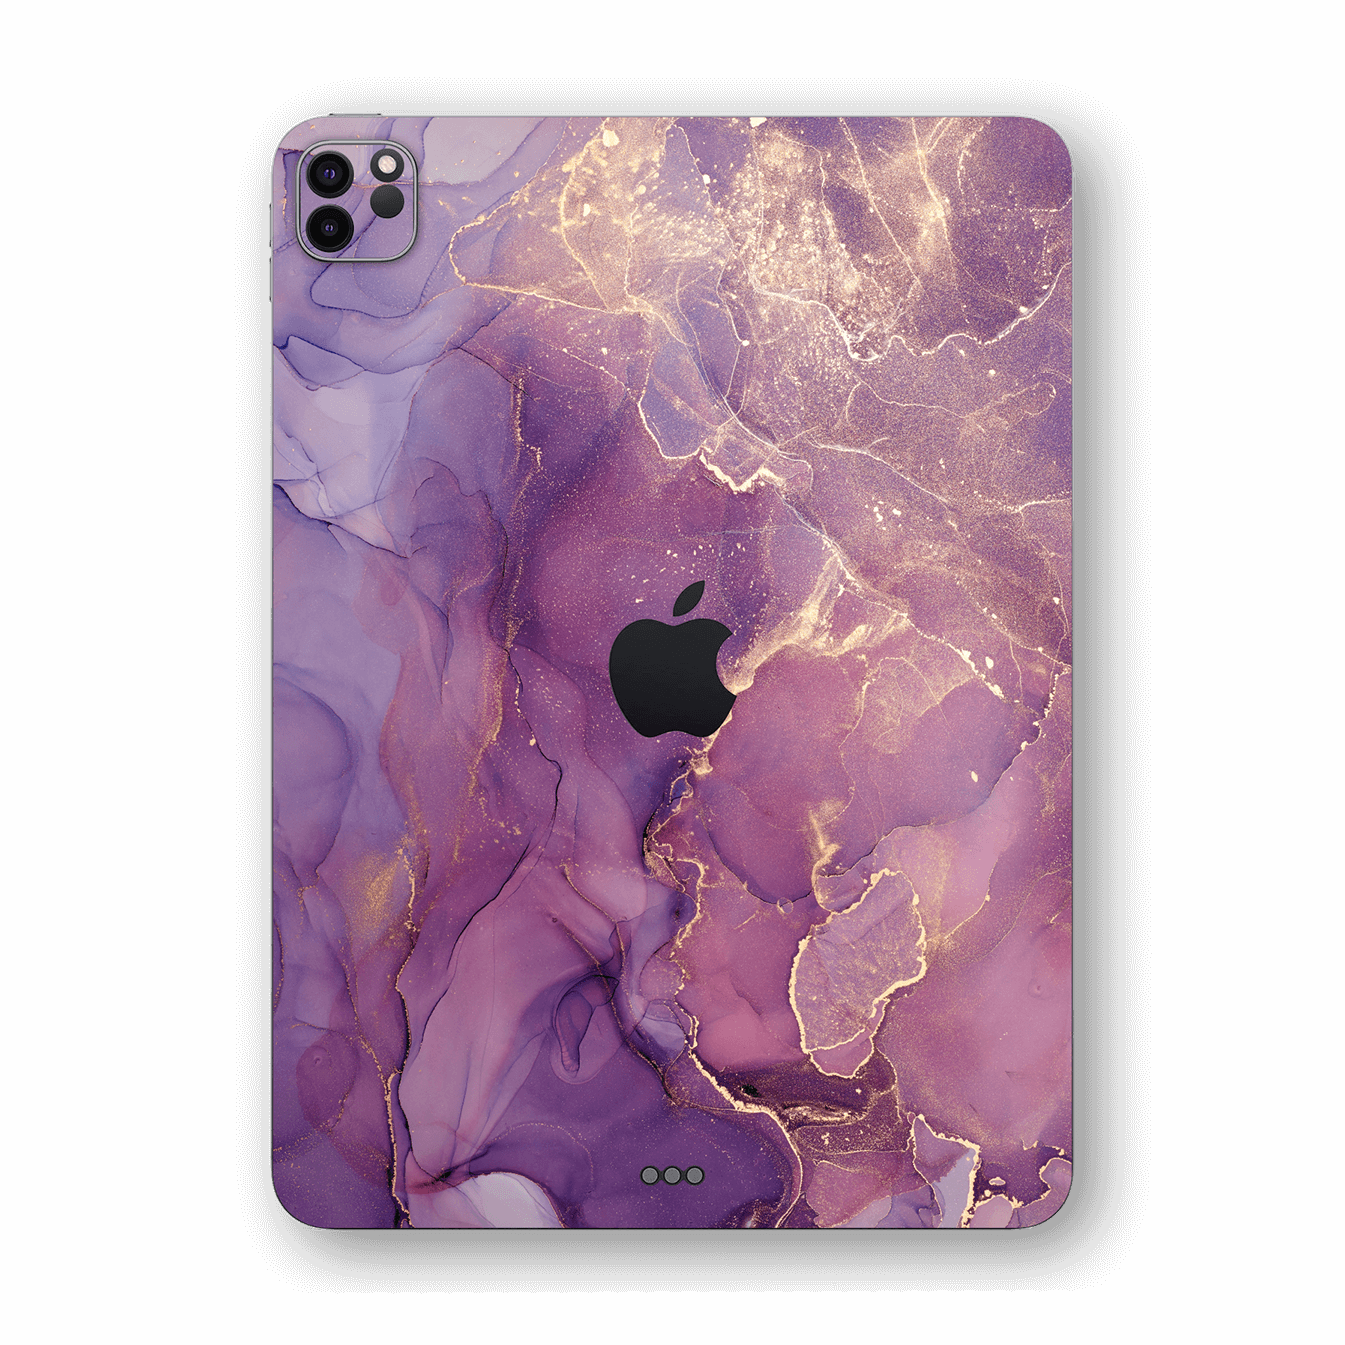 iPad PRO 11 (2020) SIGNATURE AGATE GEODE Purple-Gold Skin - AGATE GEODE Purple-Gold: 28 / NO